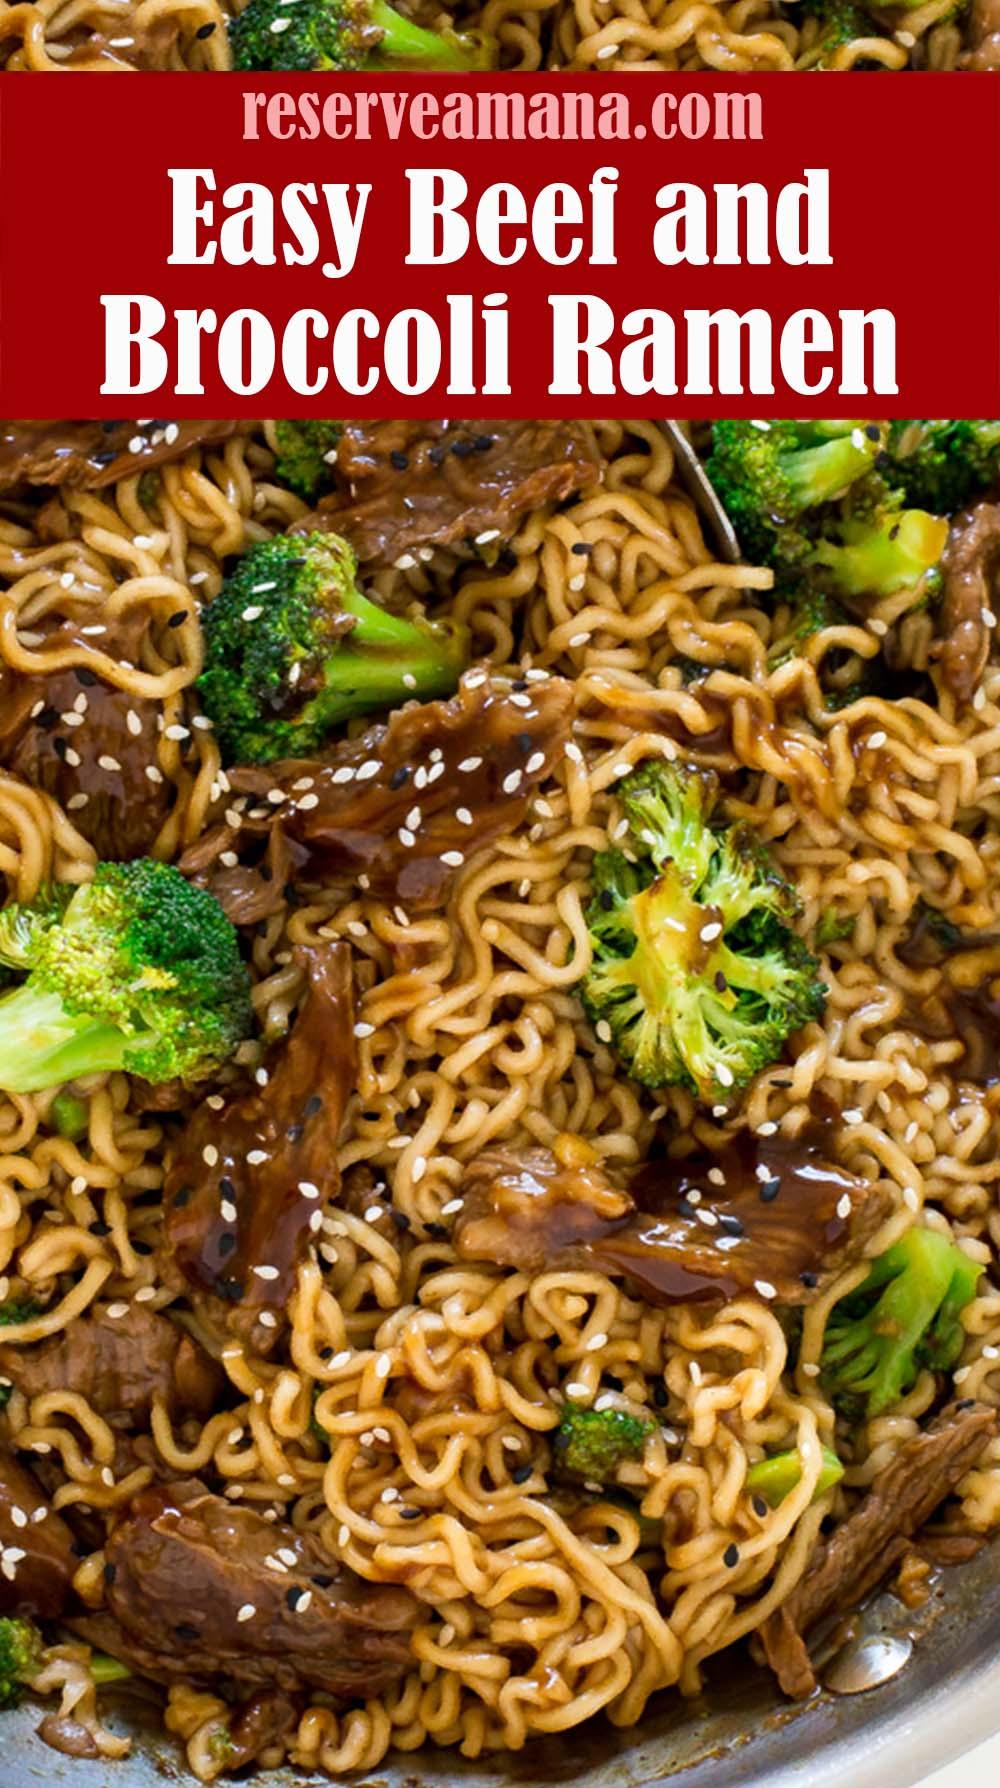 Easy Beef and Broccoli Ramen